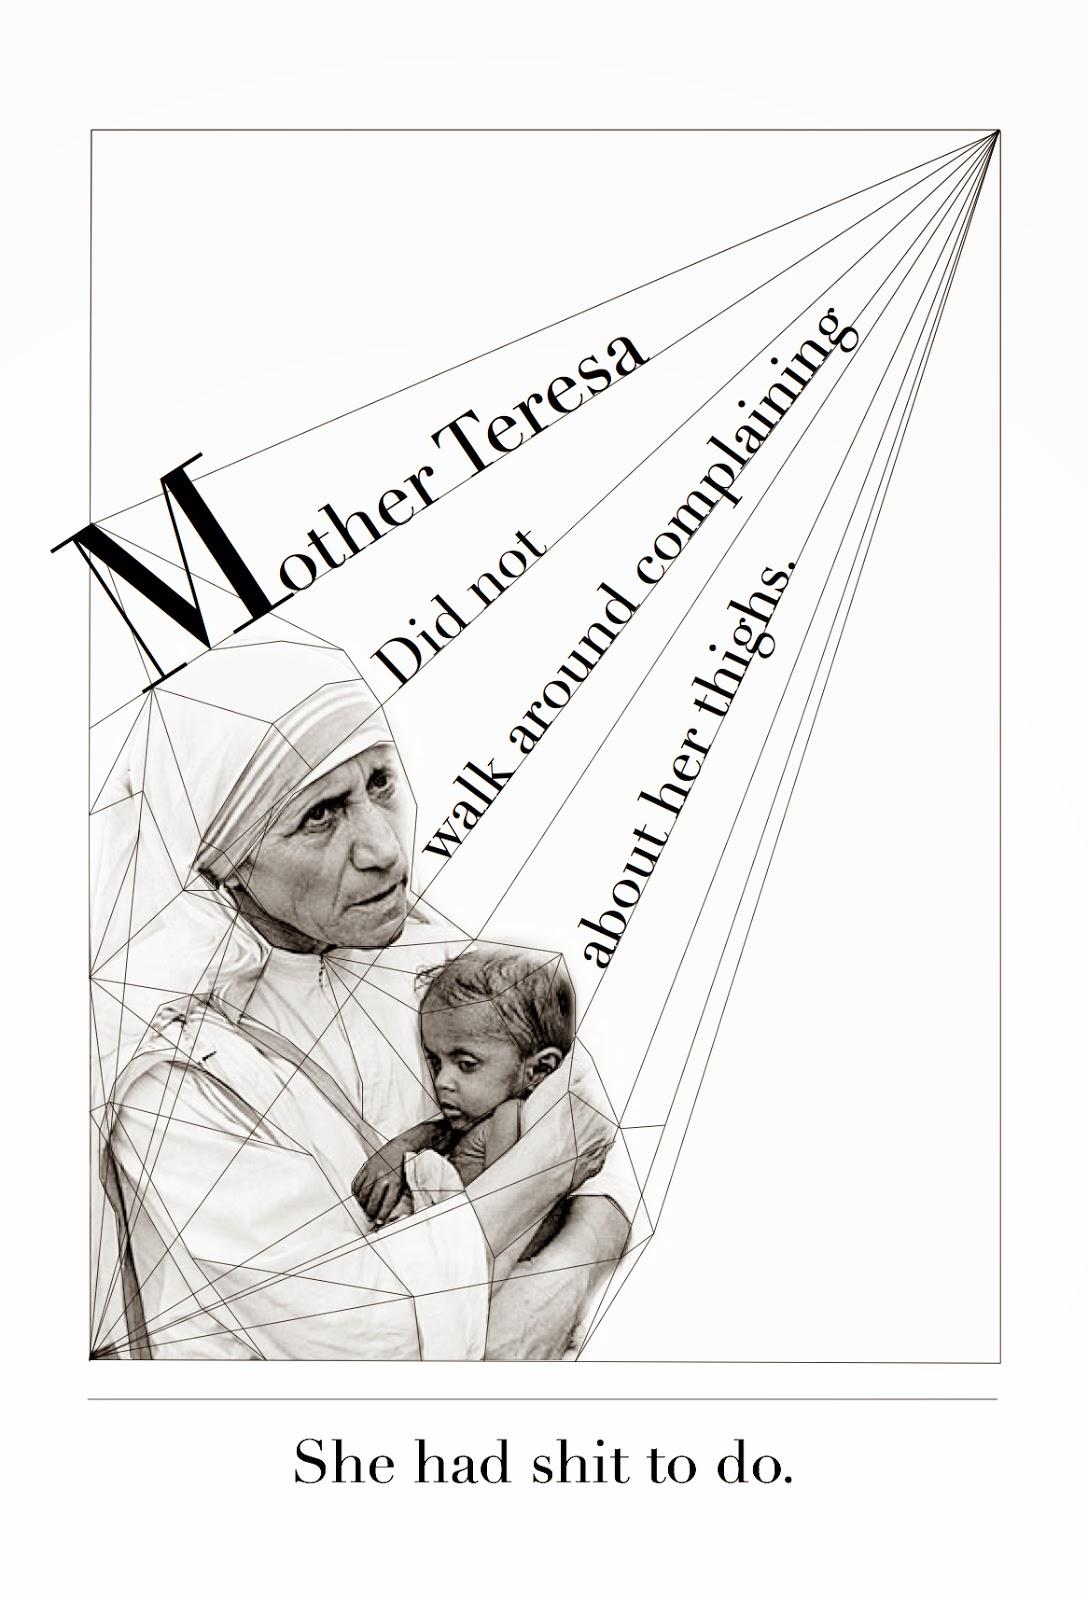 Illustrate how mother teresa demonstrate her kindness